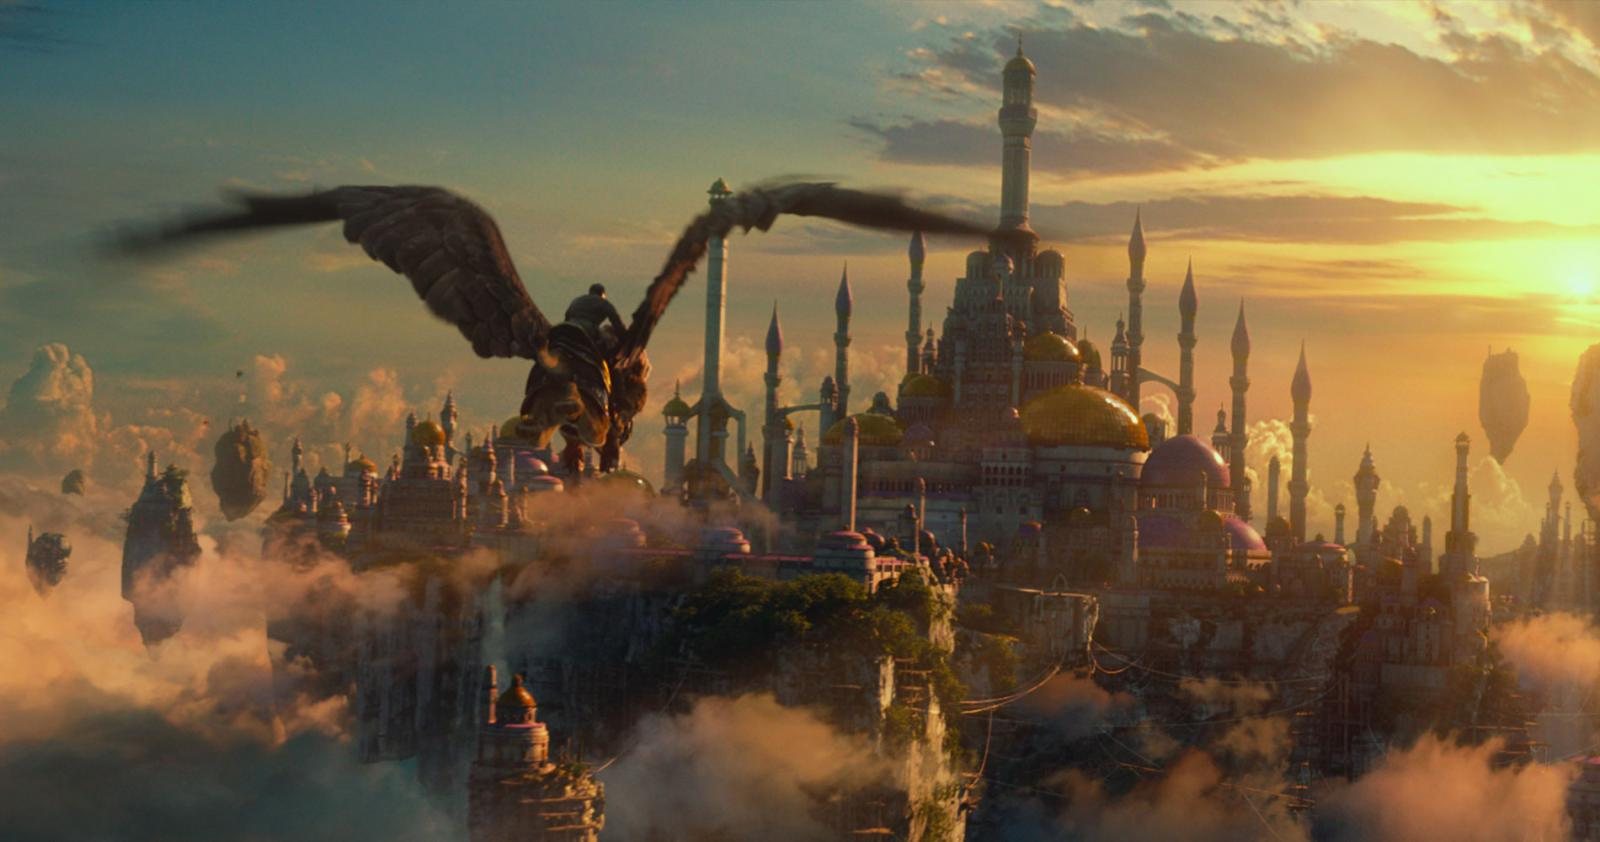 warcraft 2016 movie in hindi download